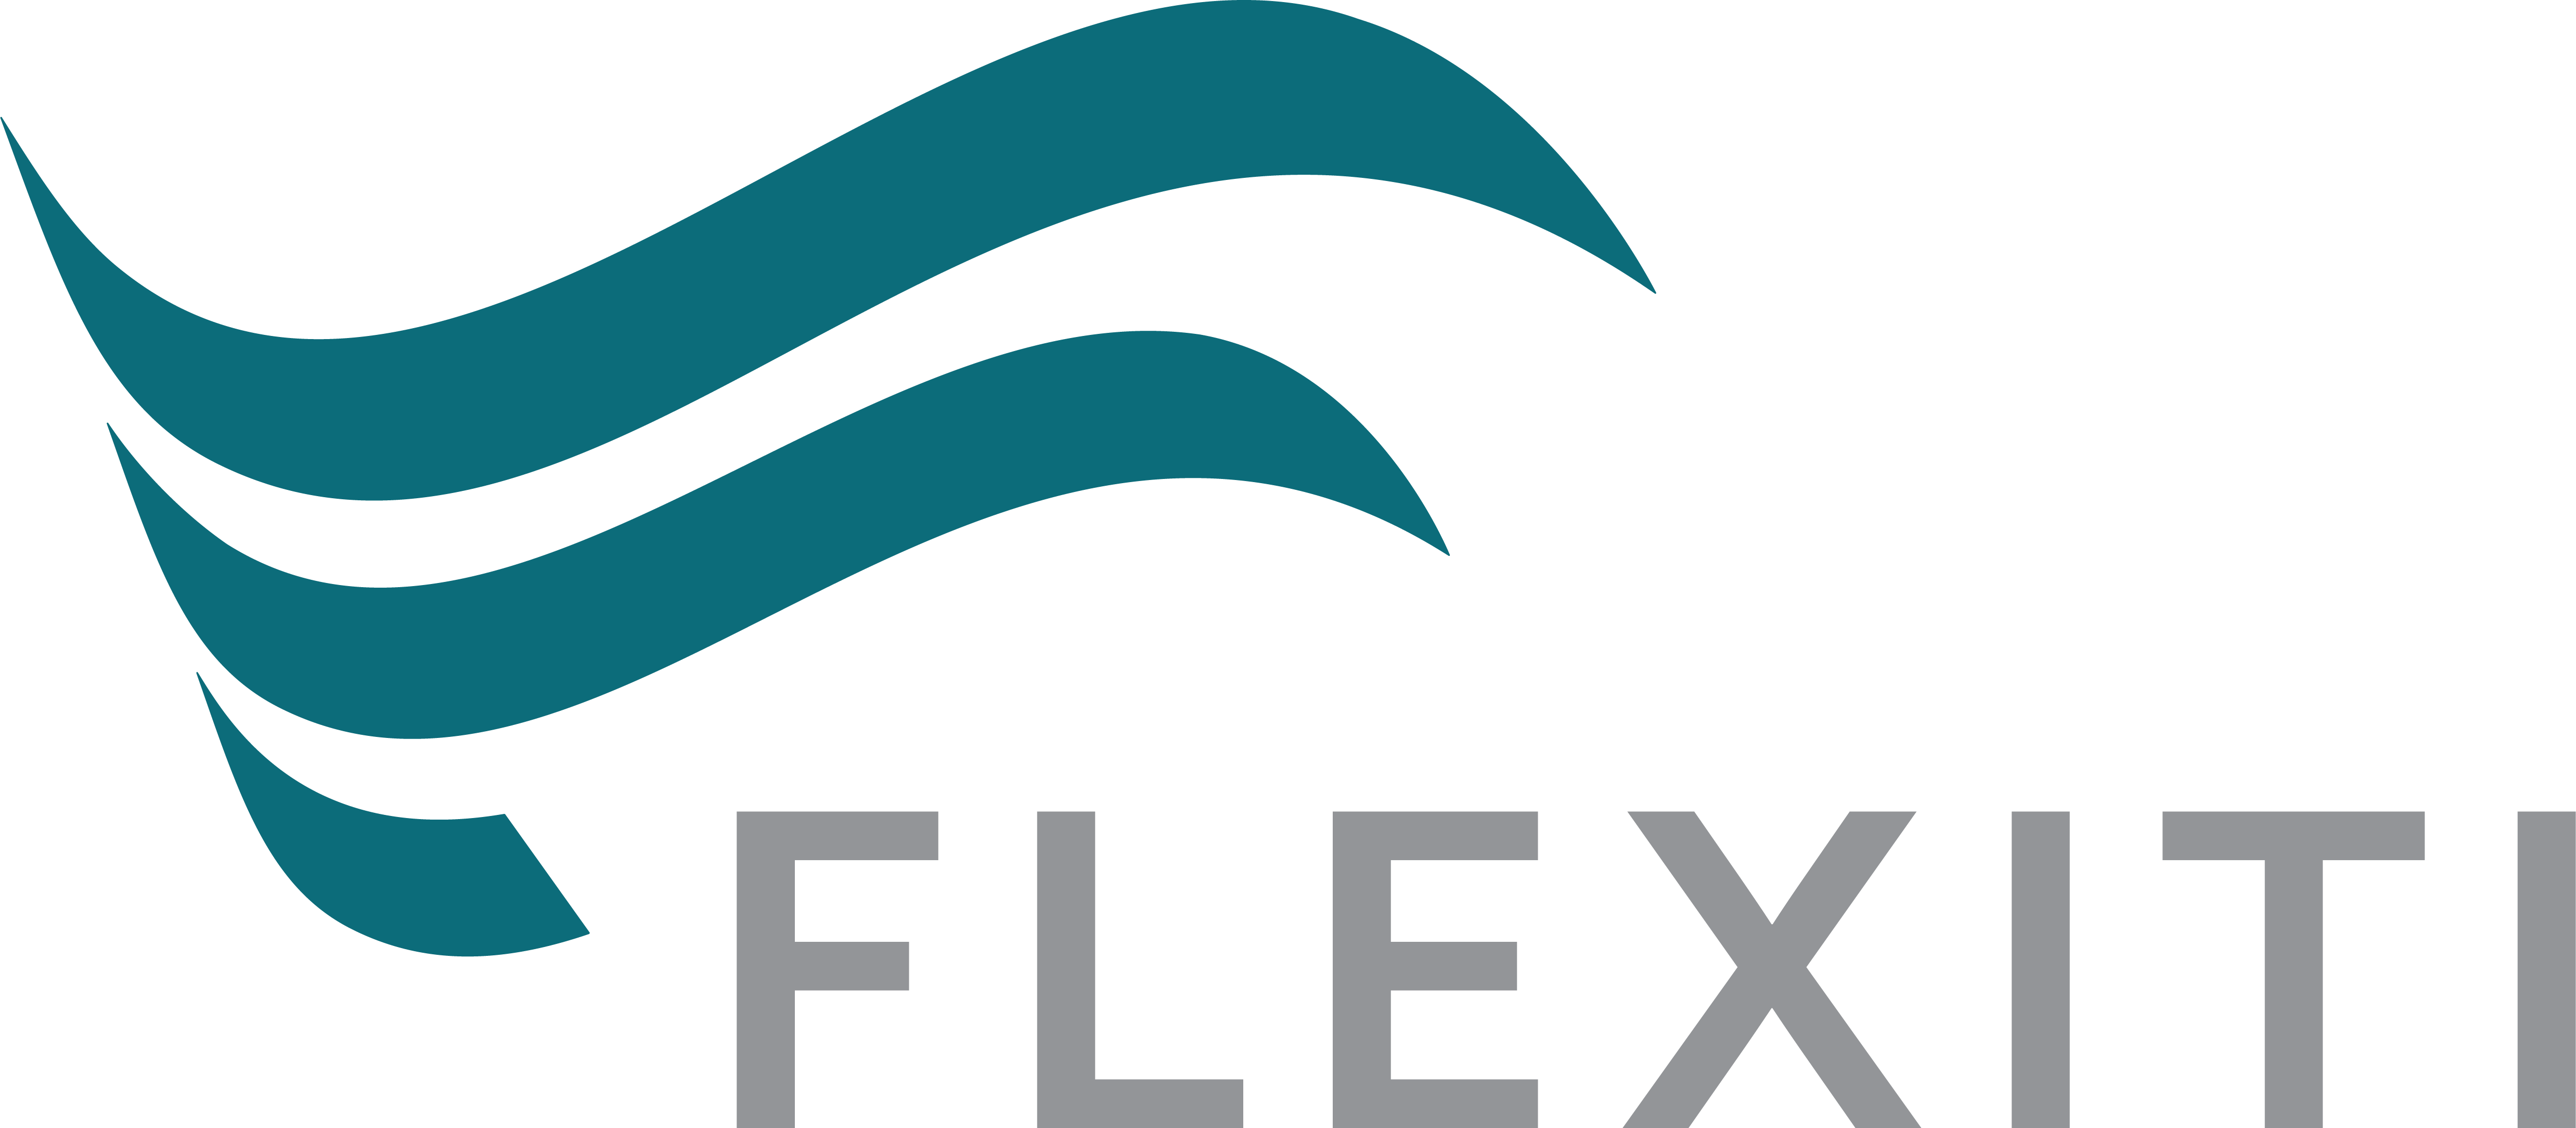 financement flexible flexiti projet cuisine salle de bain